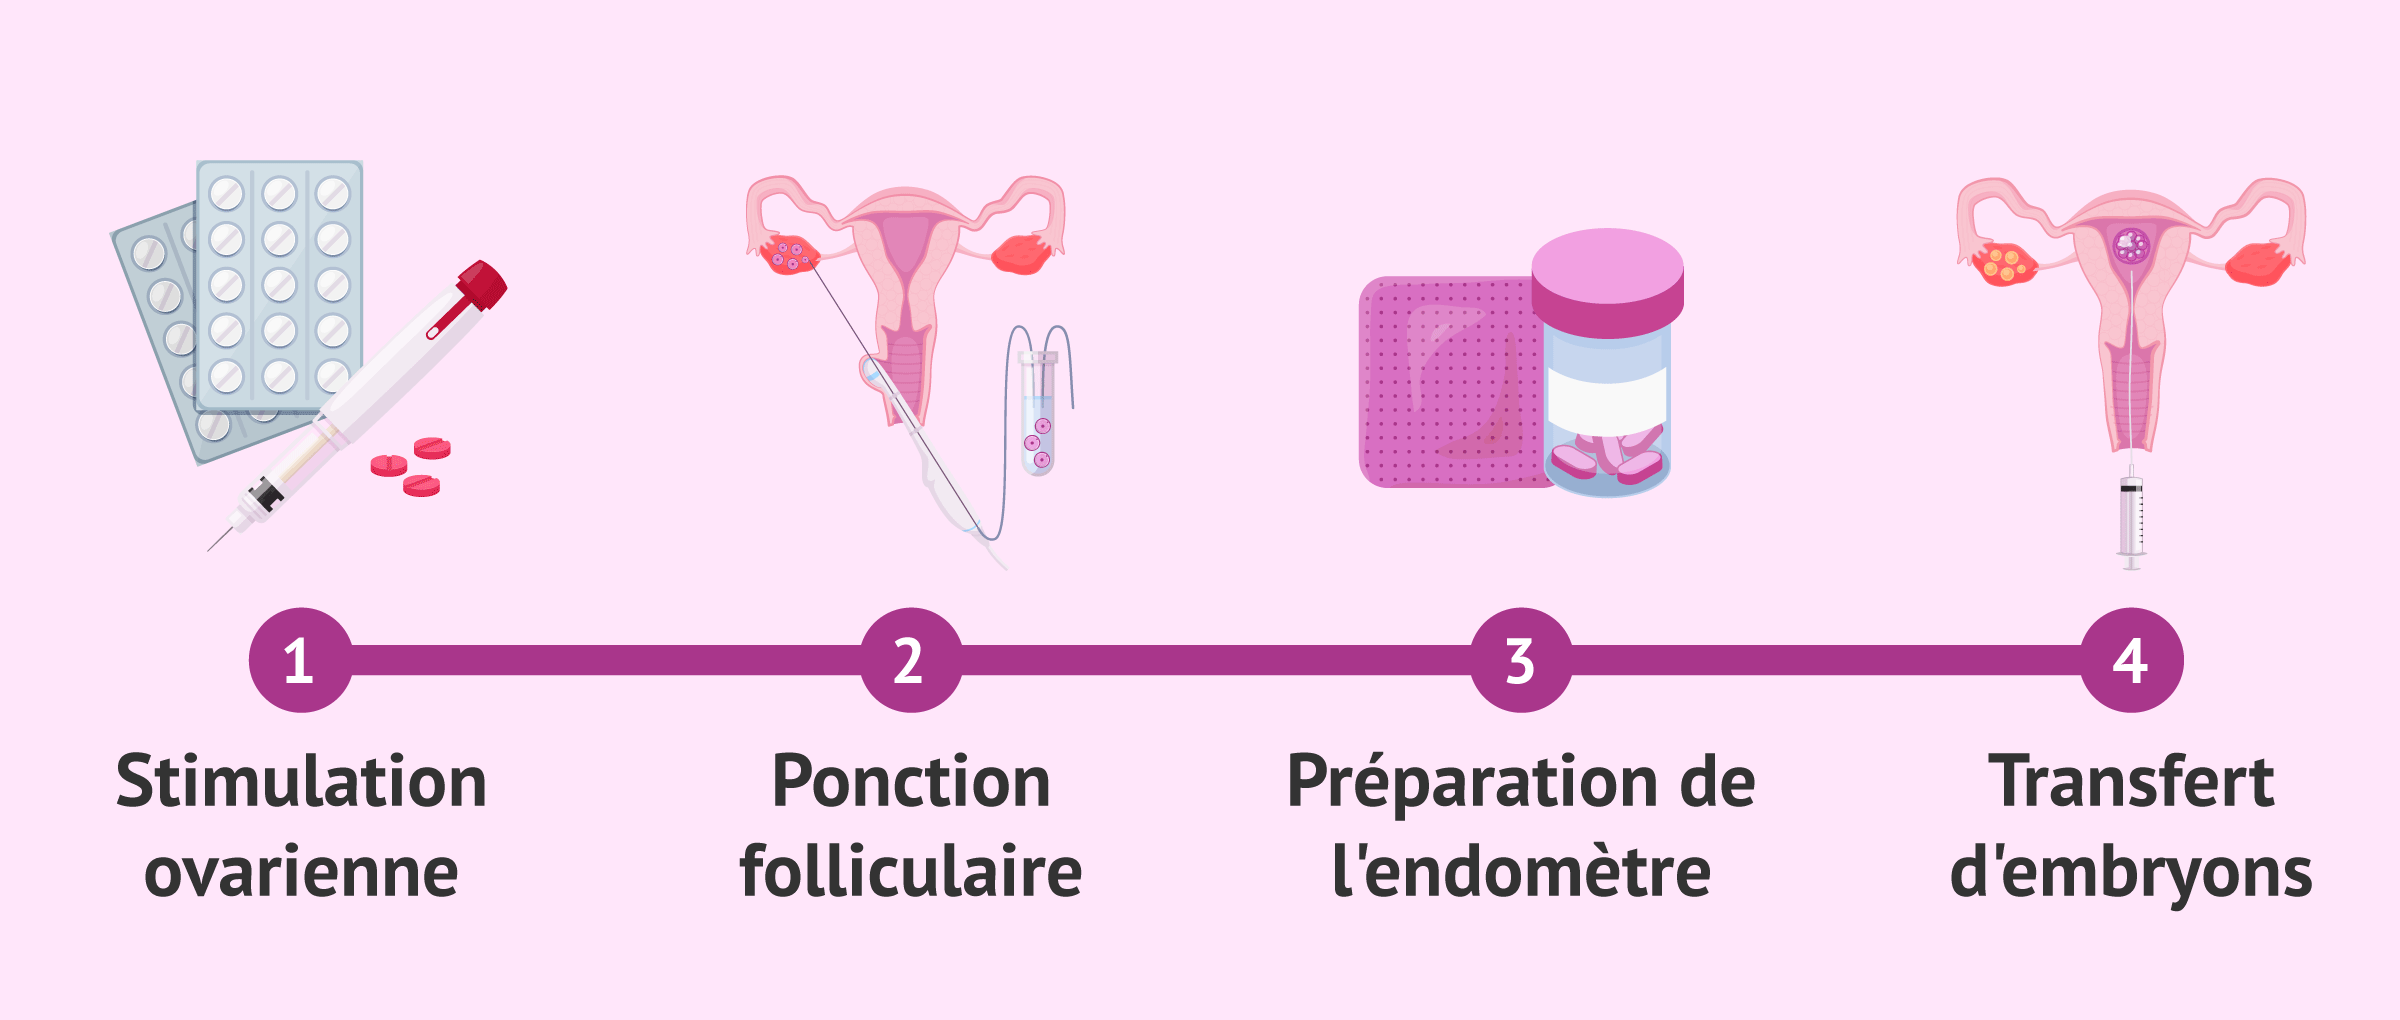 Les étapes de la FIV jusqu'au transfert de l'embryon